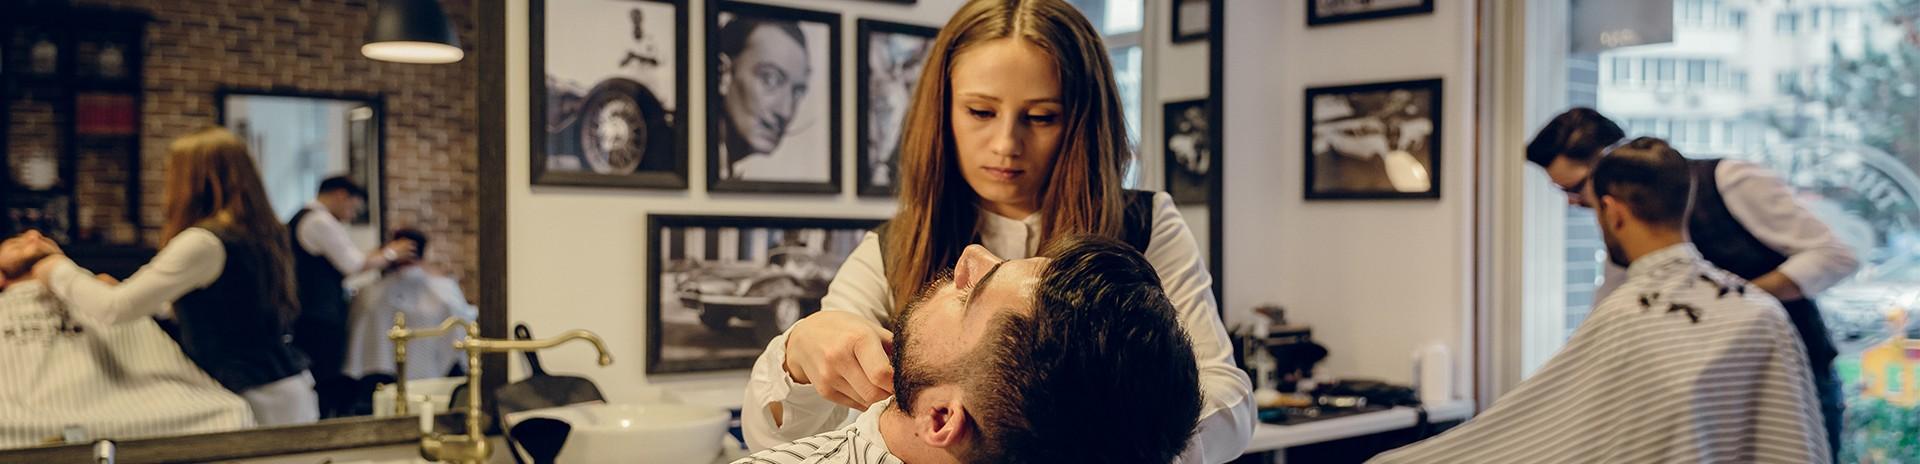 frizerie-titulescu-bucuresti-barber-shop-tuns-barba-the-barber